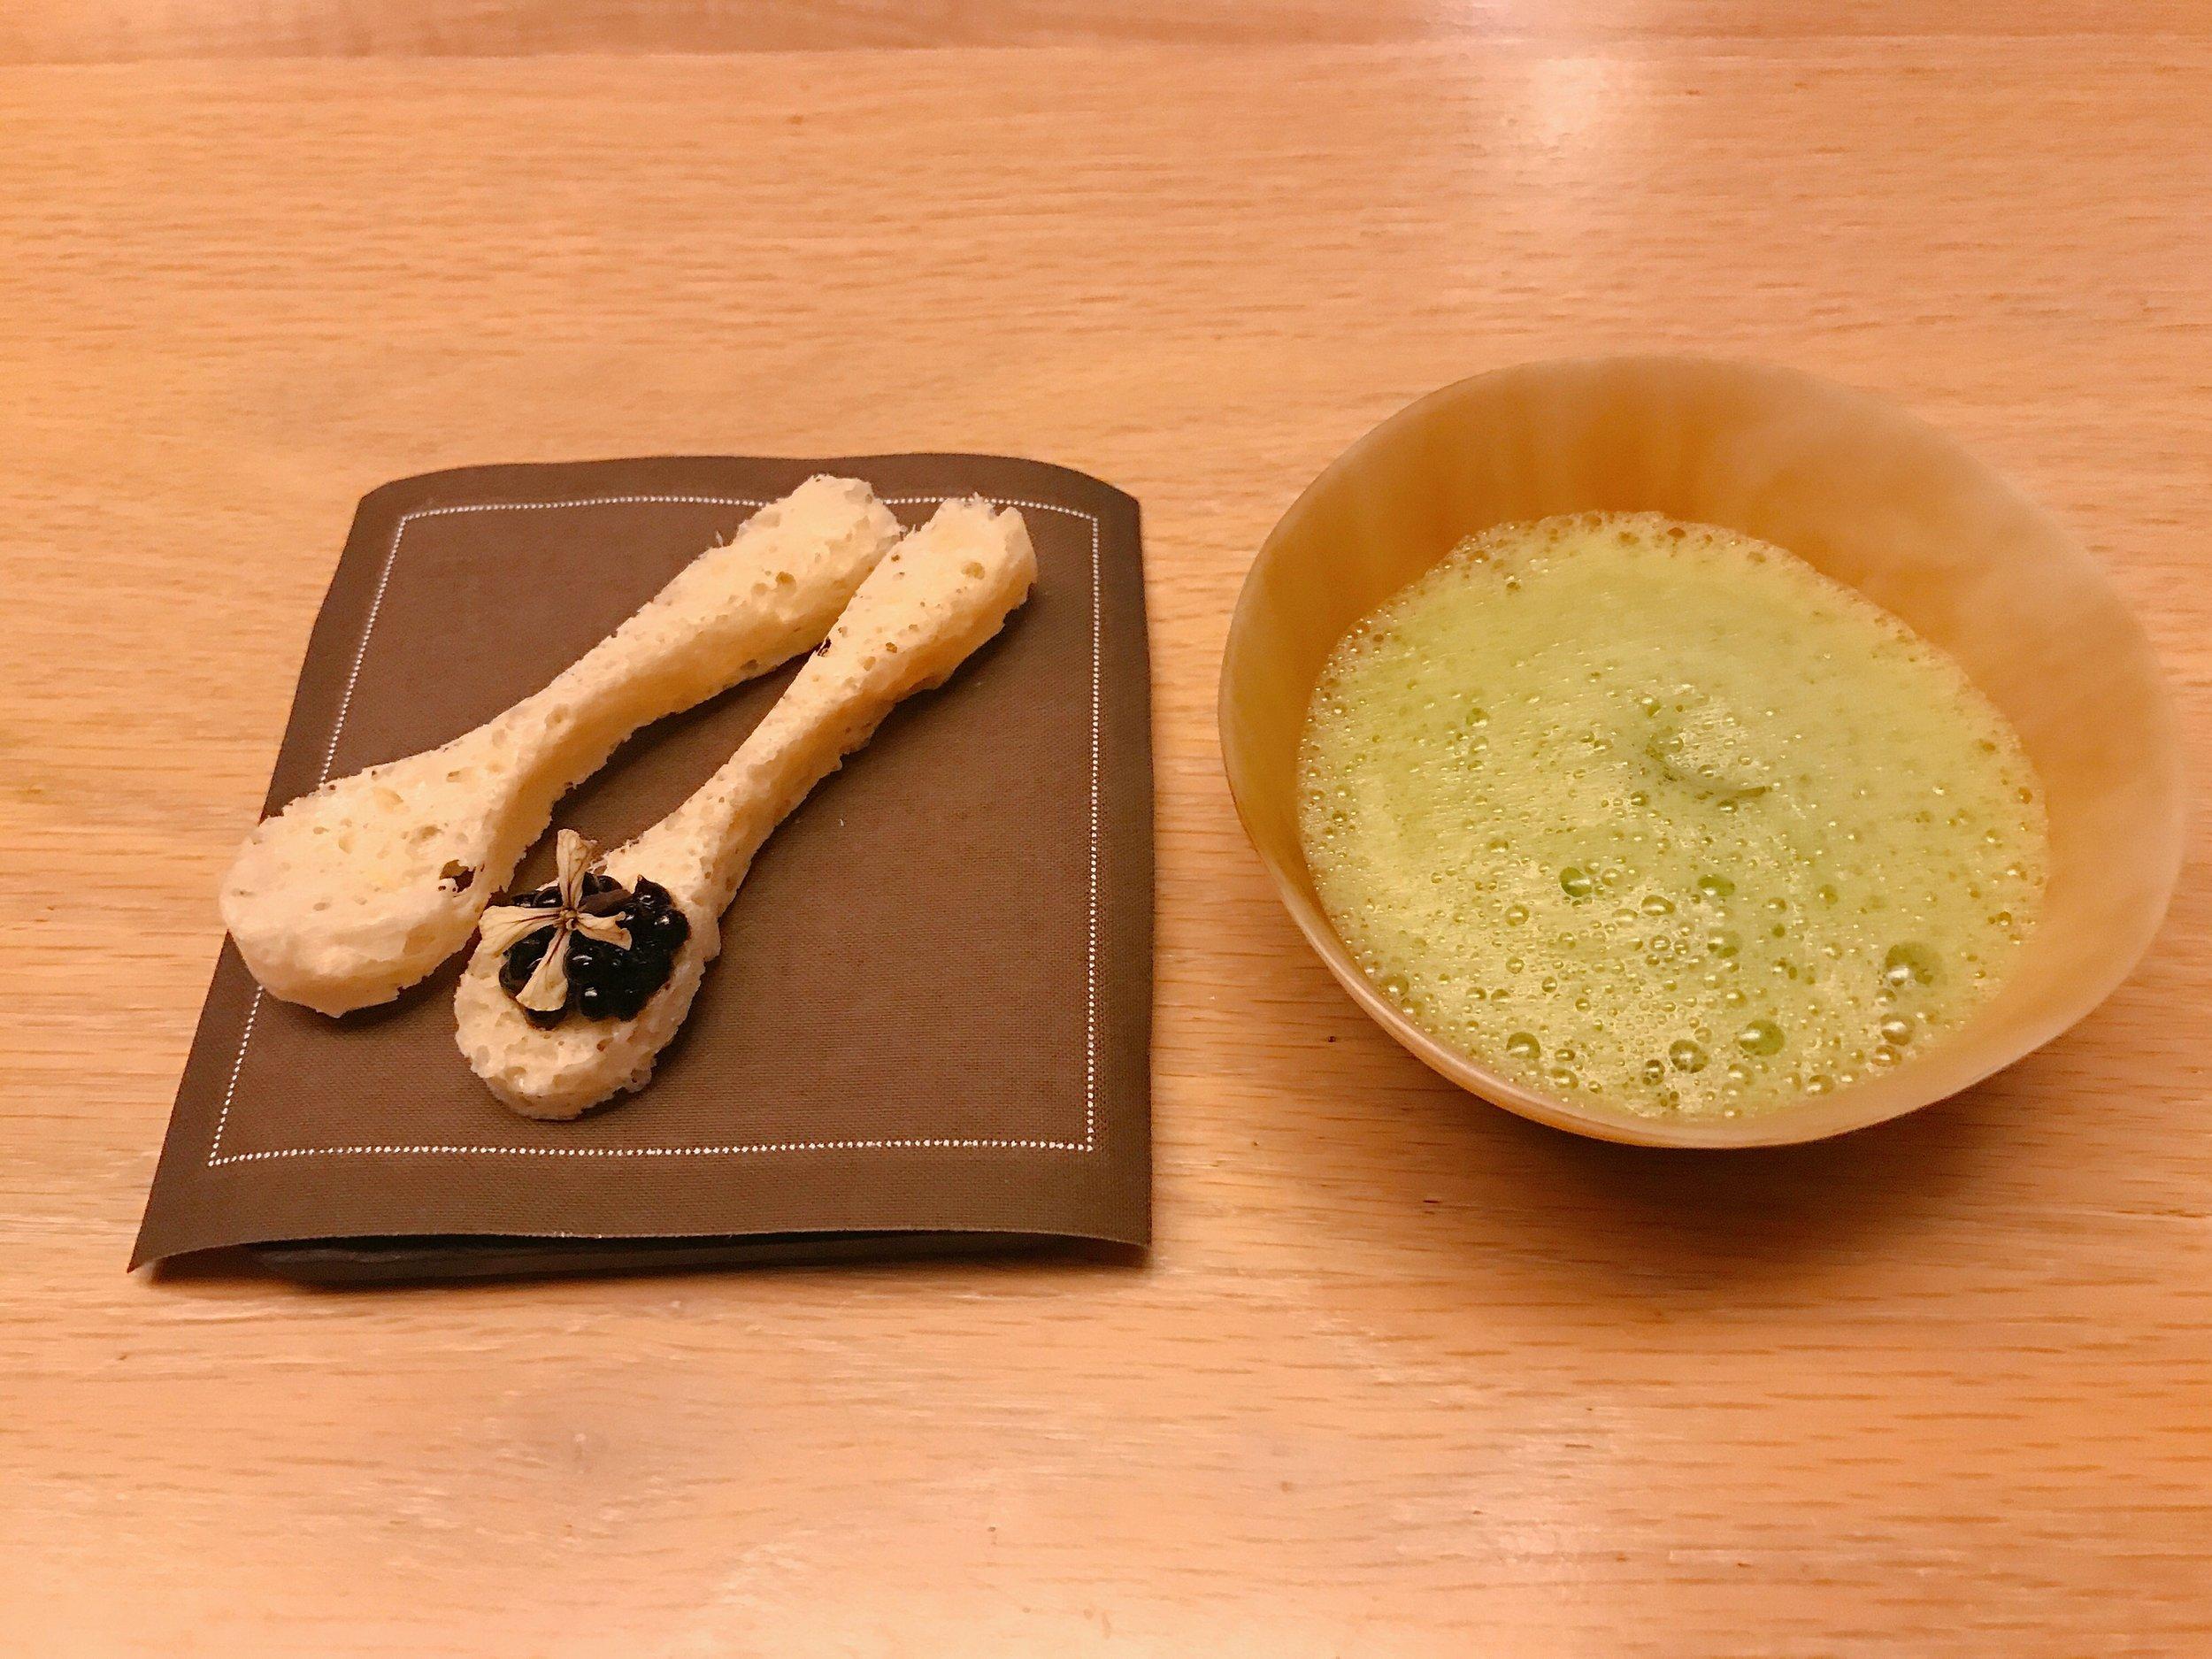 Parmesan Spoons with Basil Concoction